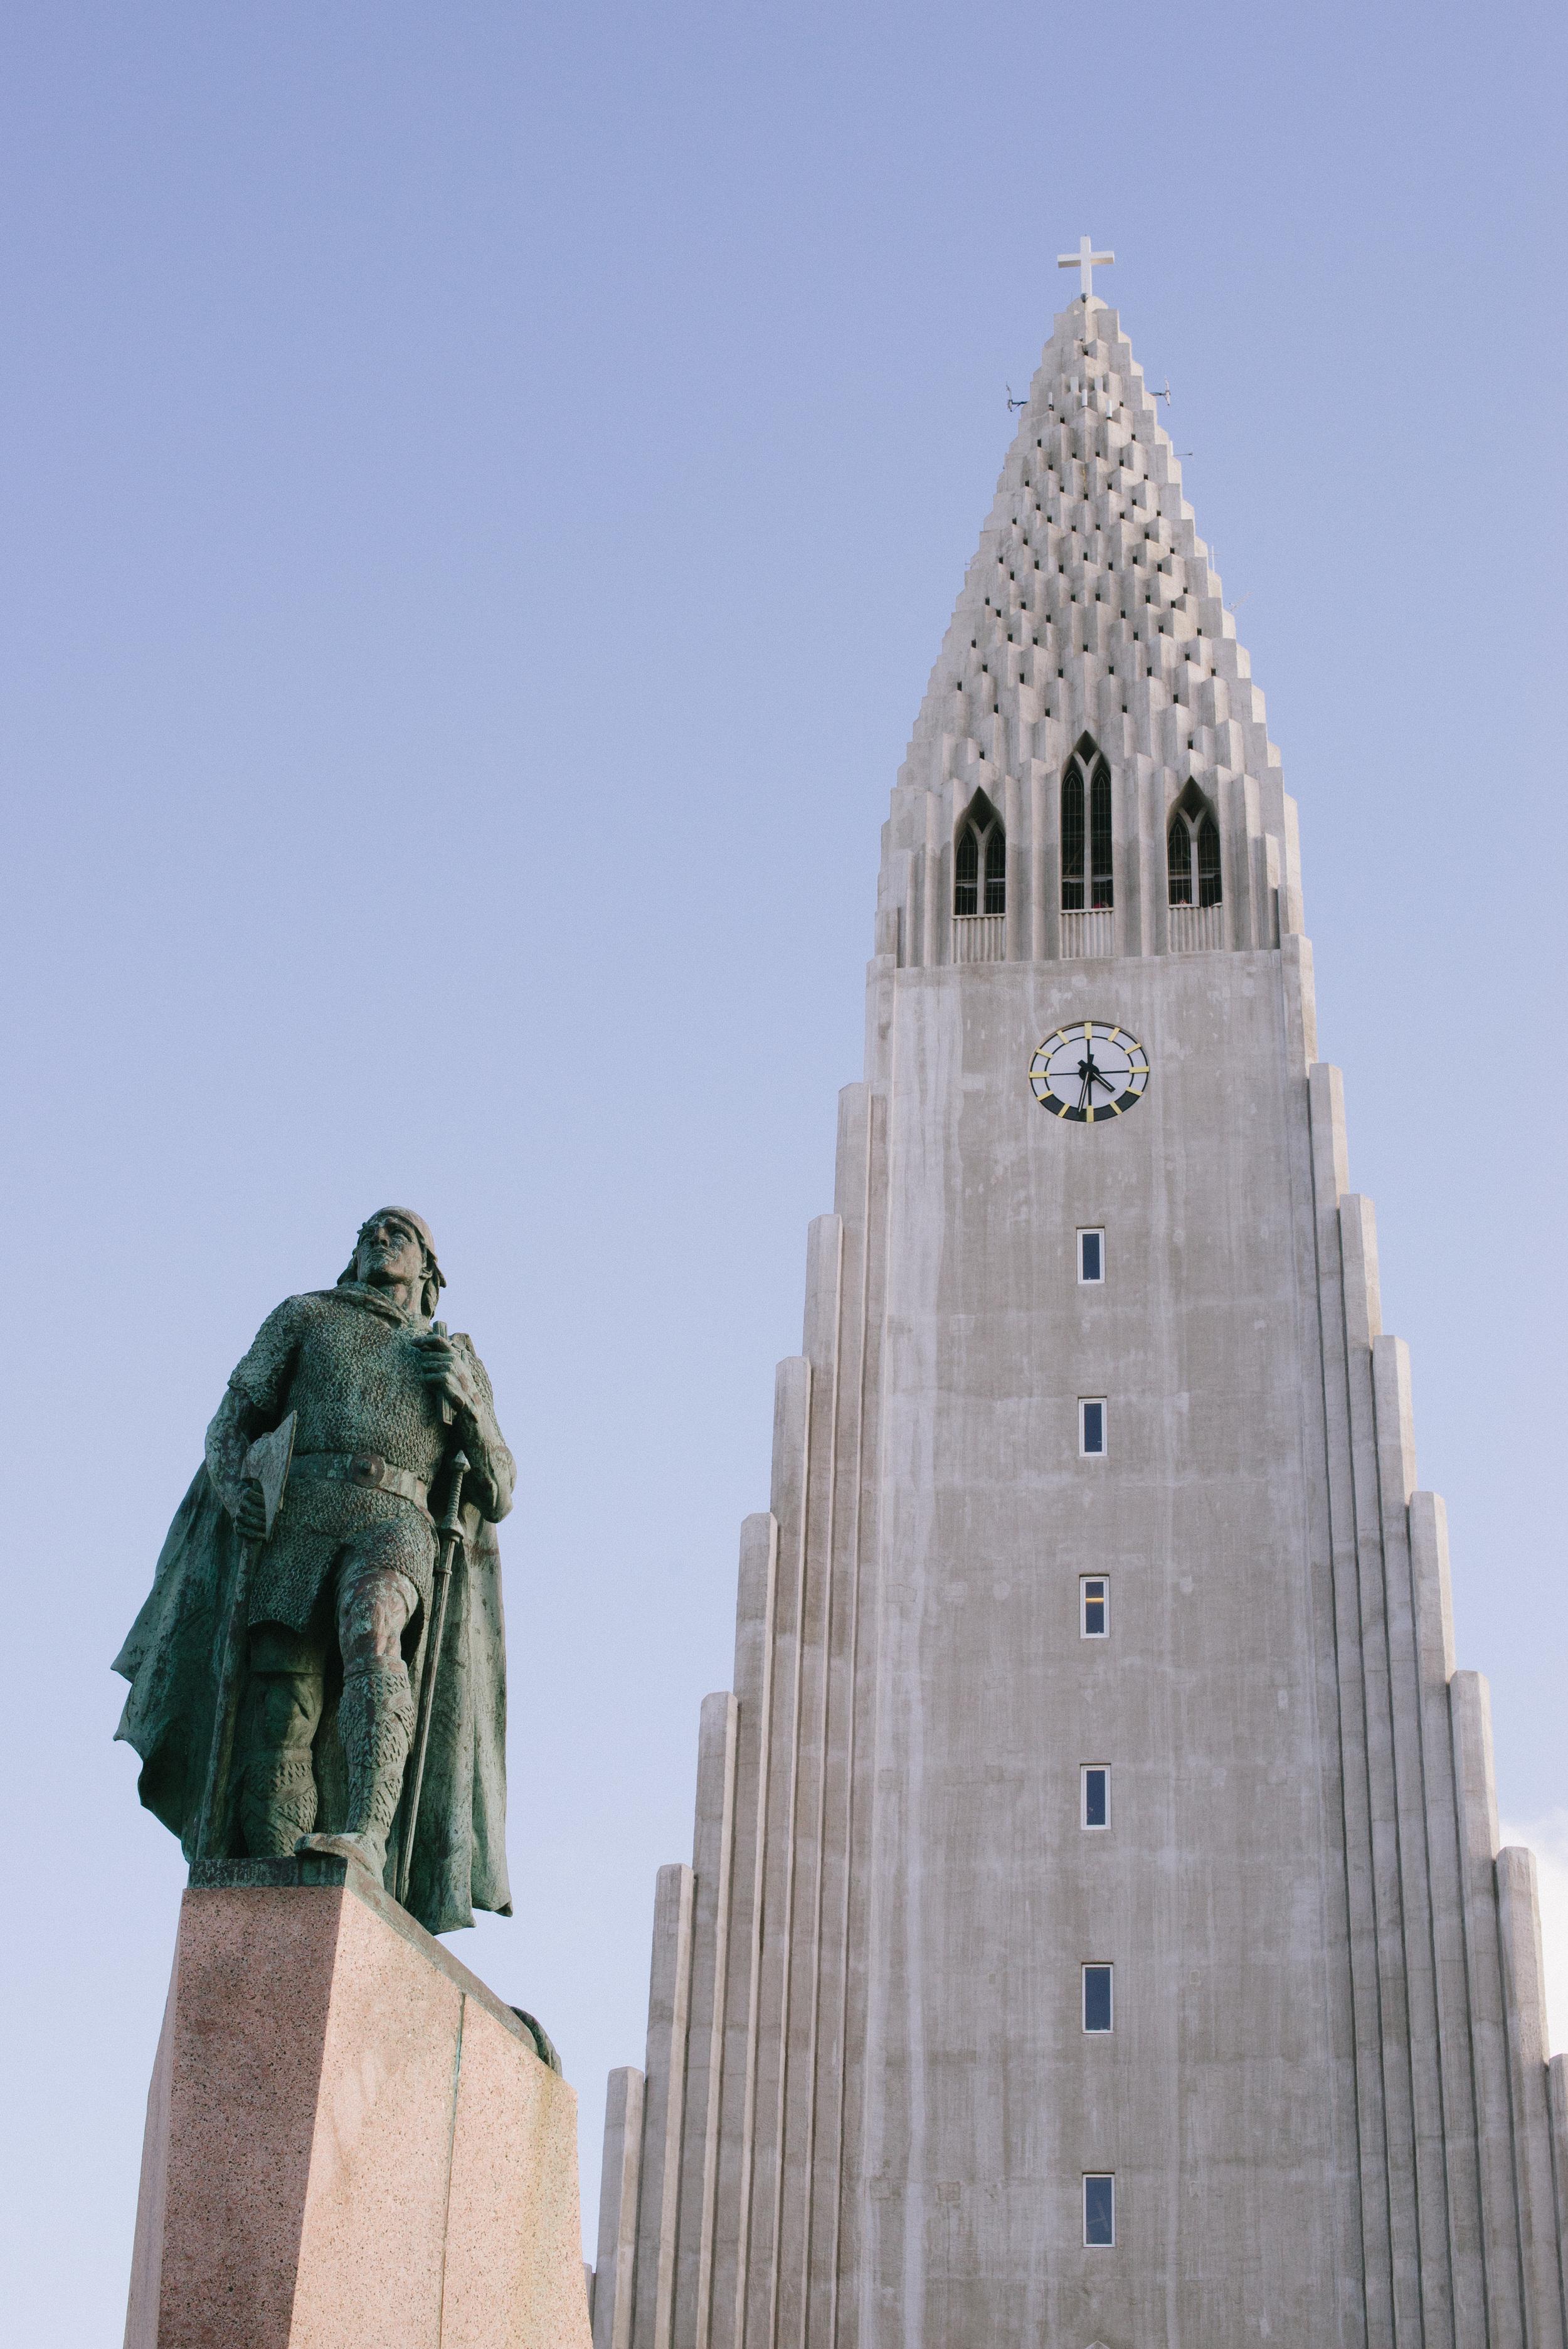 Evening walk about downtown Reykjavik and Hallgrimskirkja.